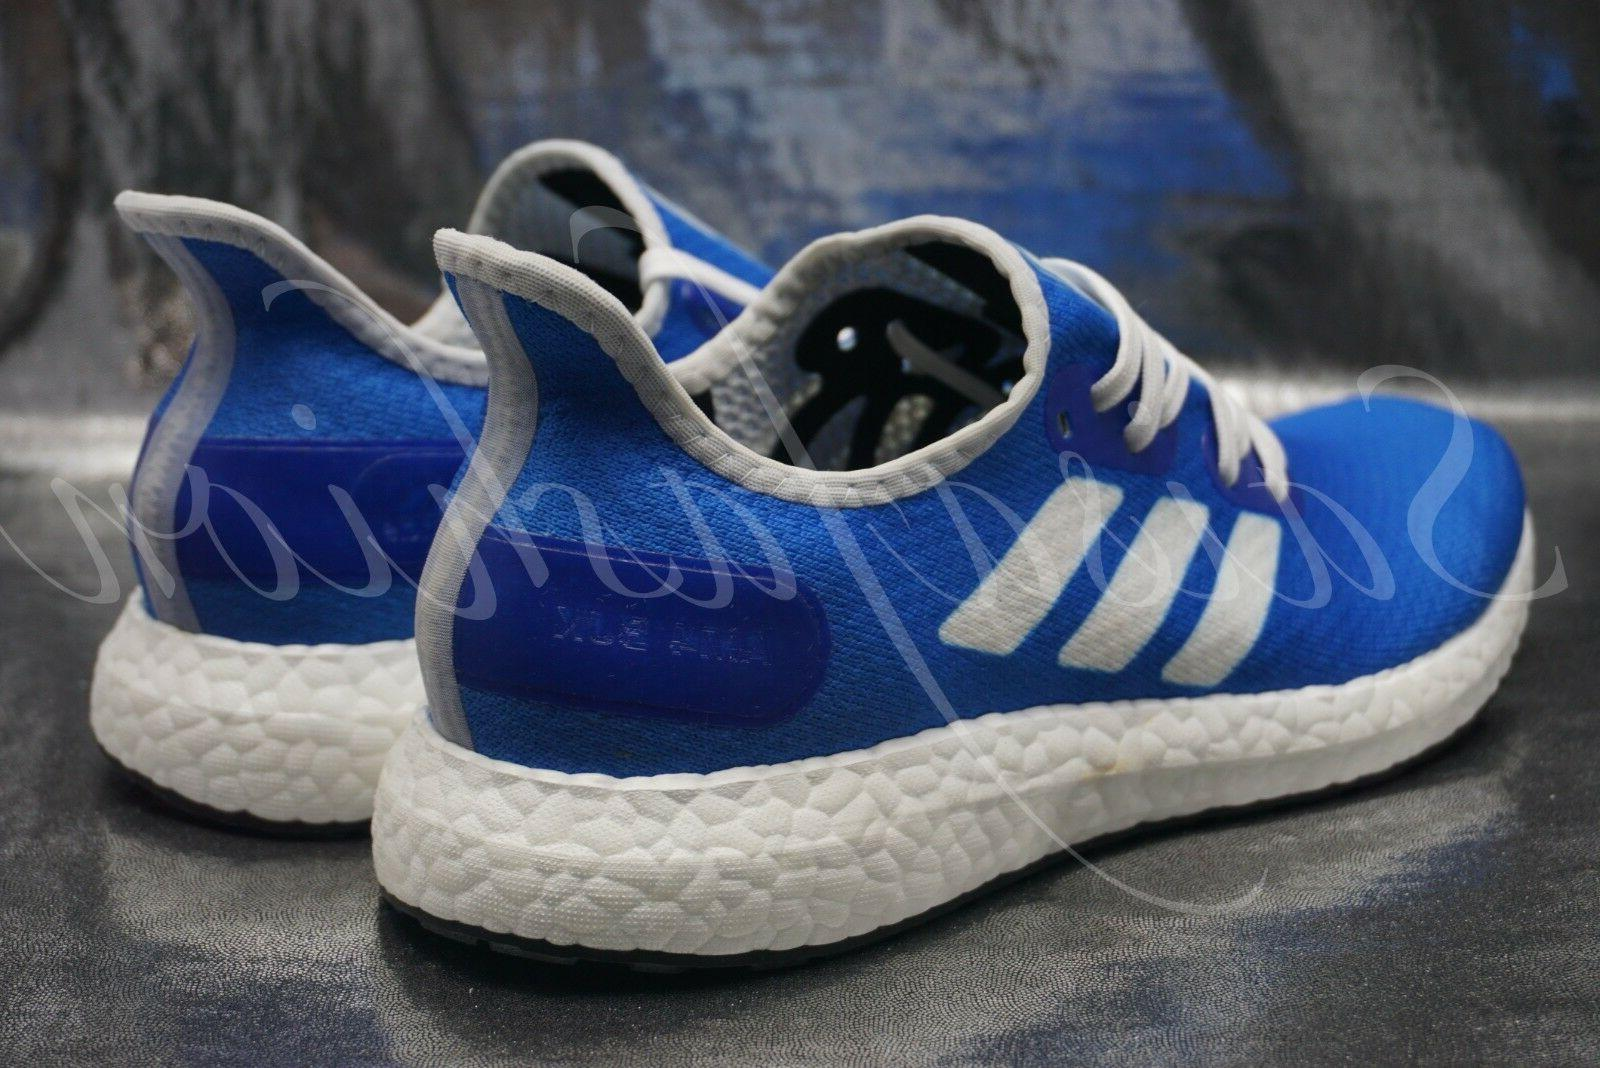 Adidas Billie of Size 7